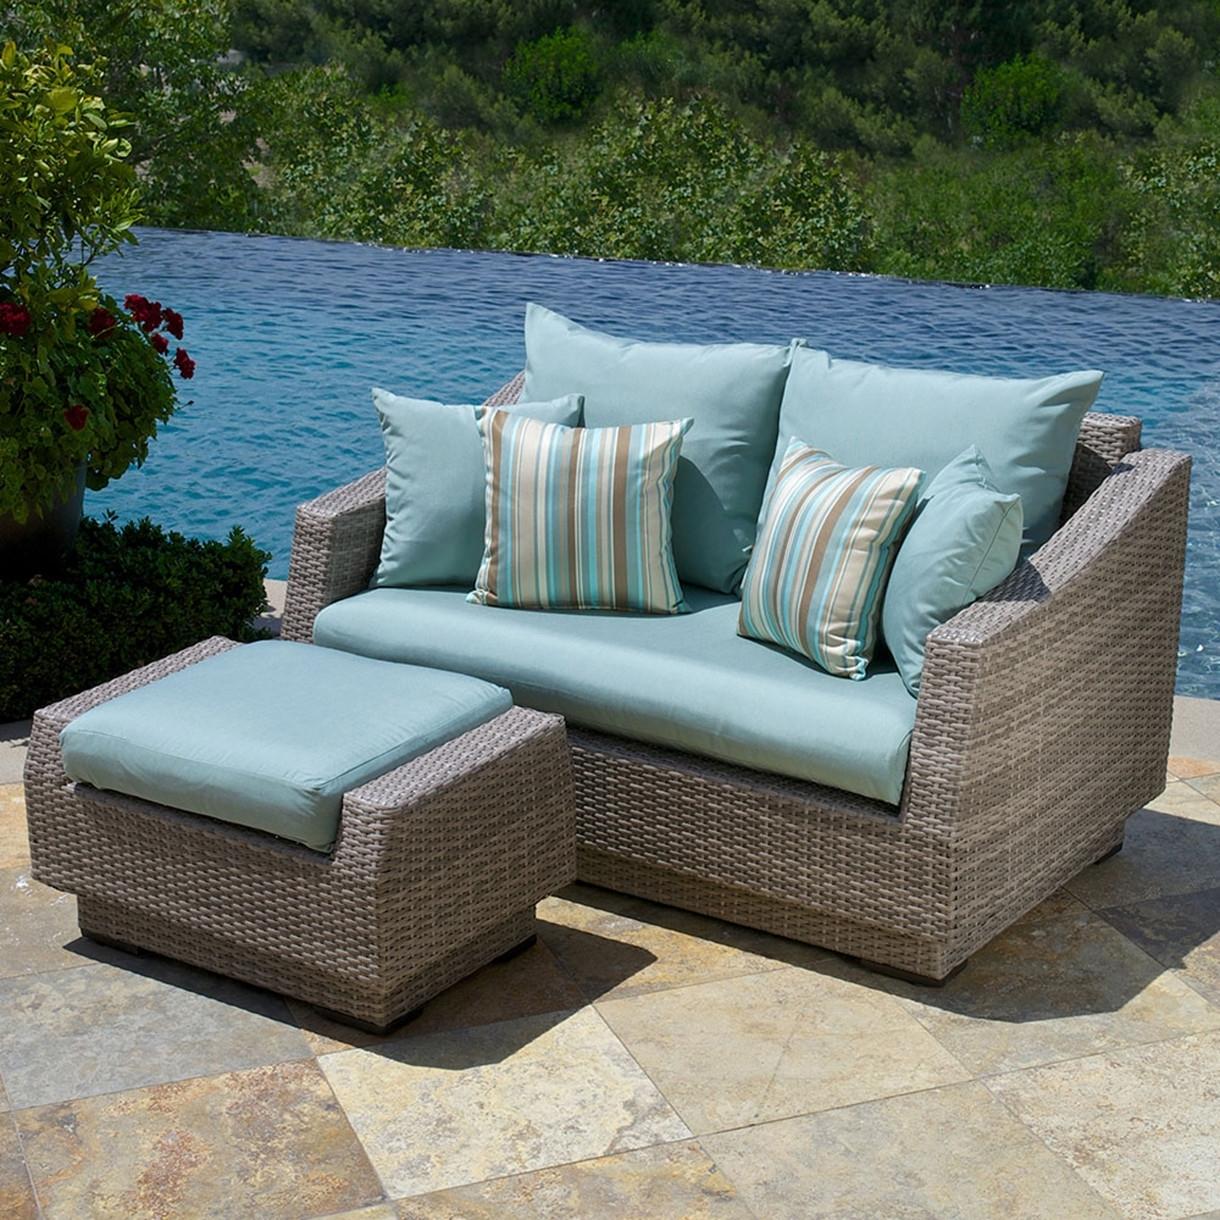 Cuscini per sedie da giardino sedie per giardino - Cuscini per poltrone da giardino ...